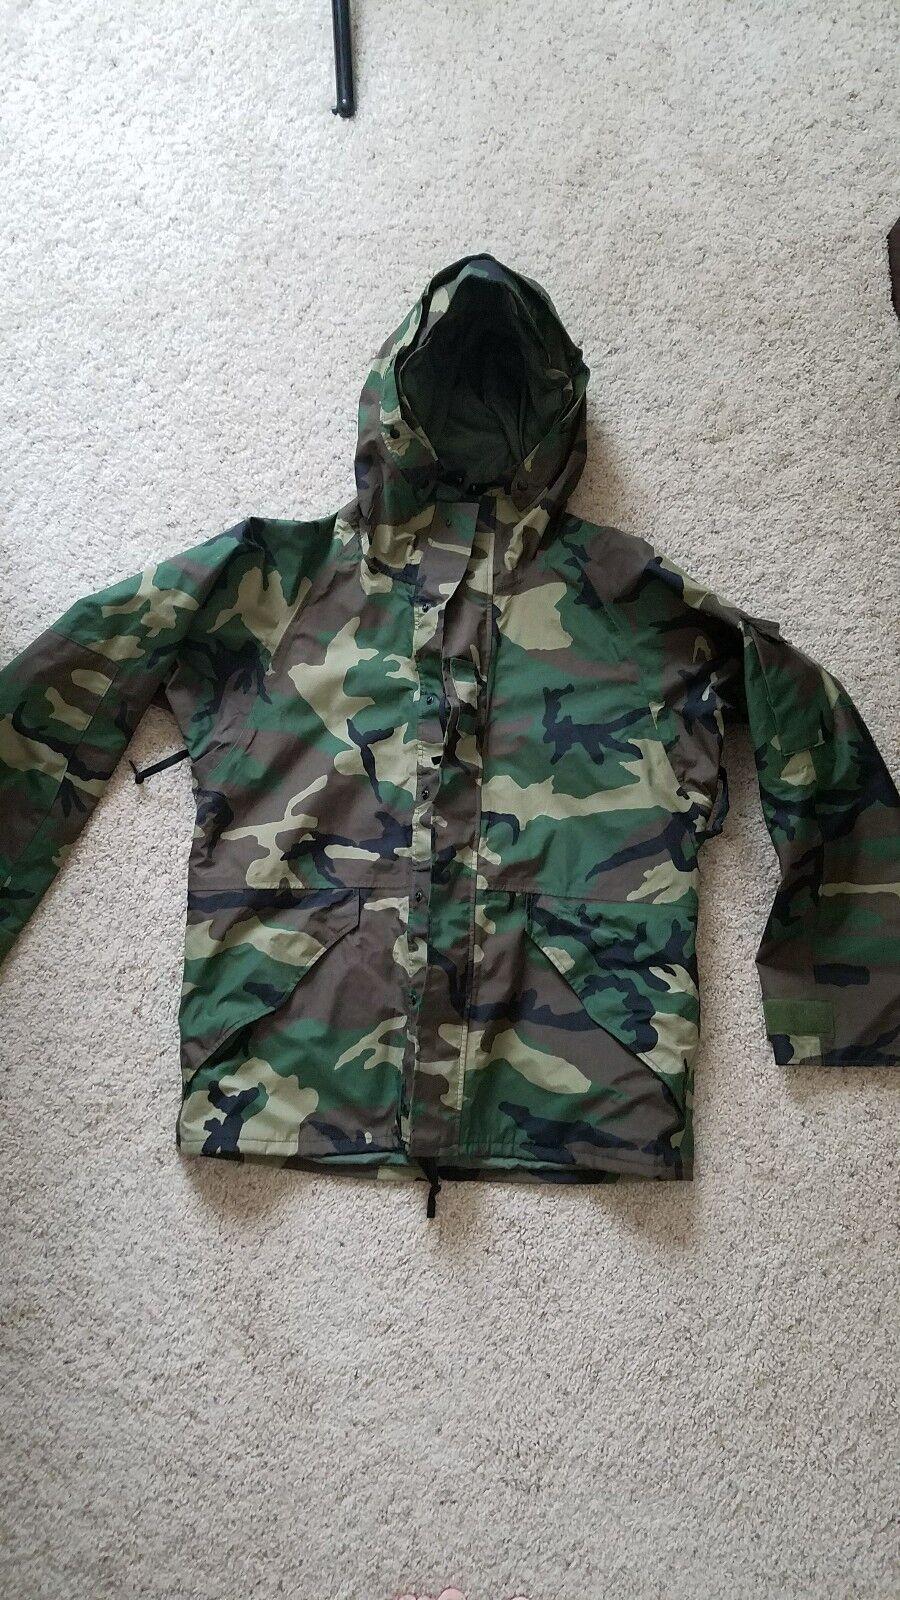 Military Hooded Camo weatherproof Coat Größe large regular